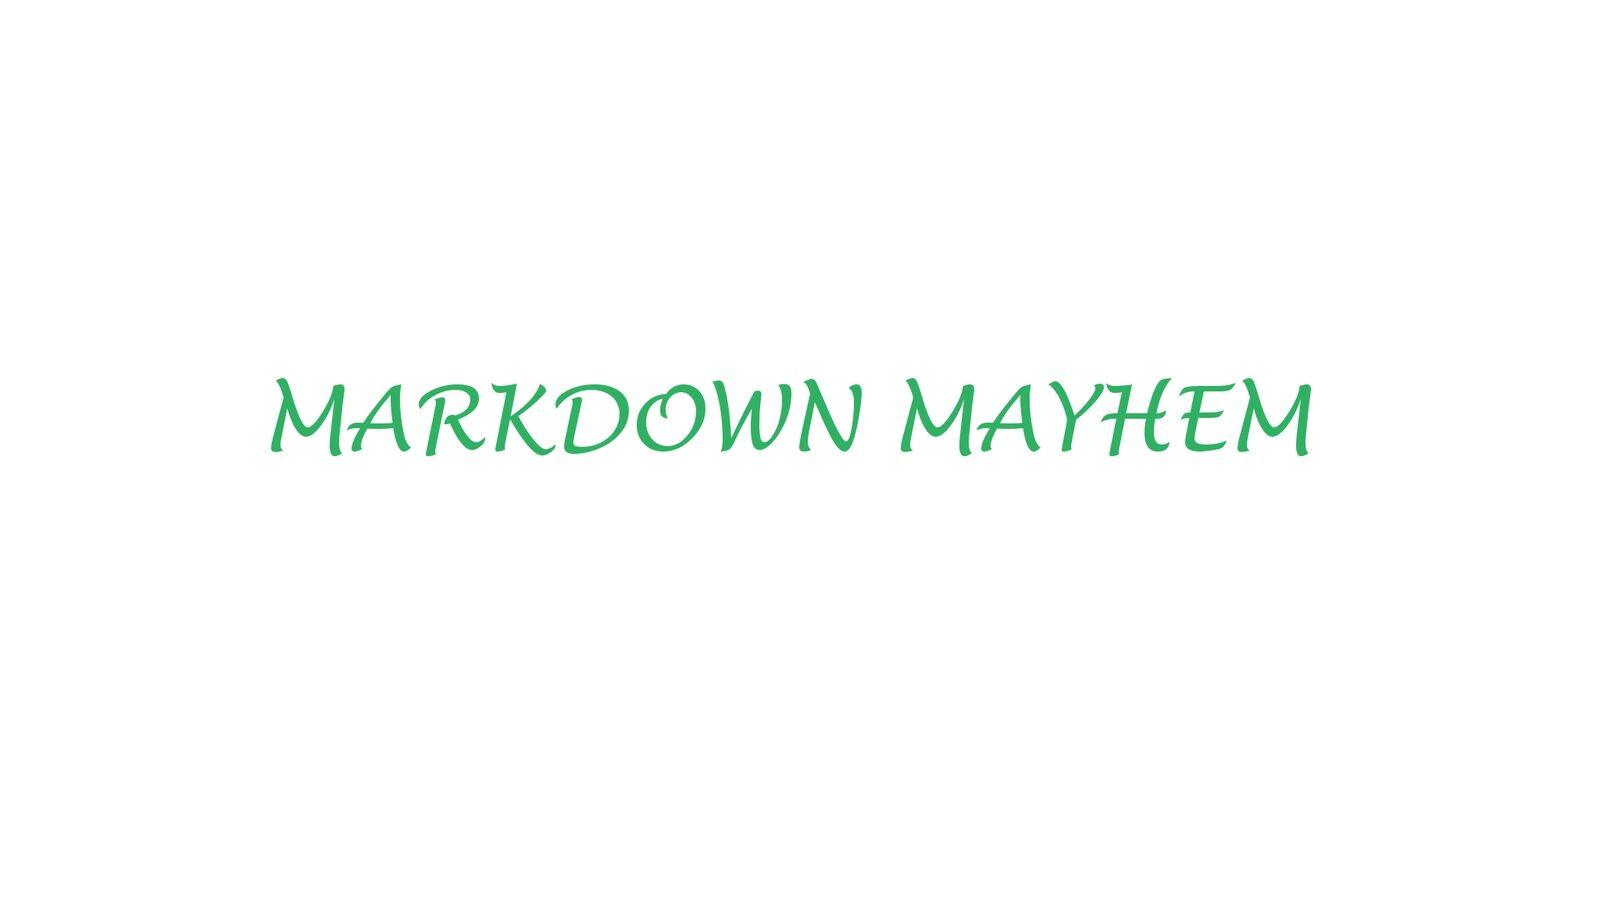 Markdown Mayhem